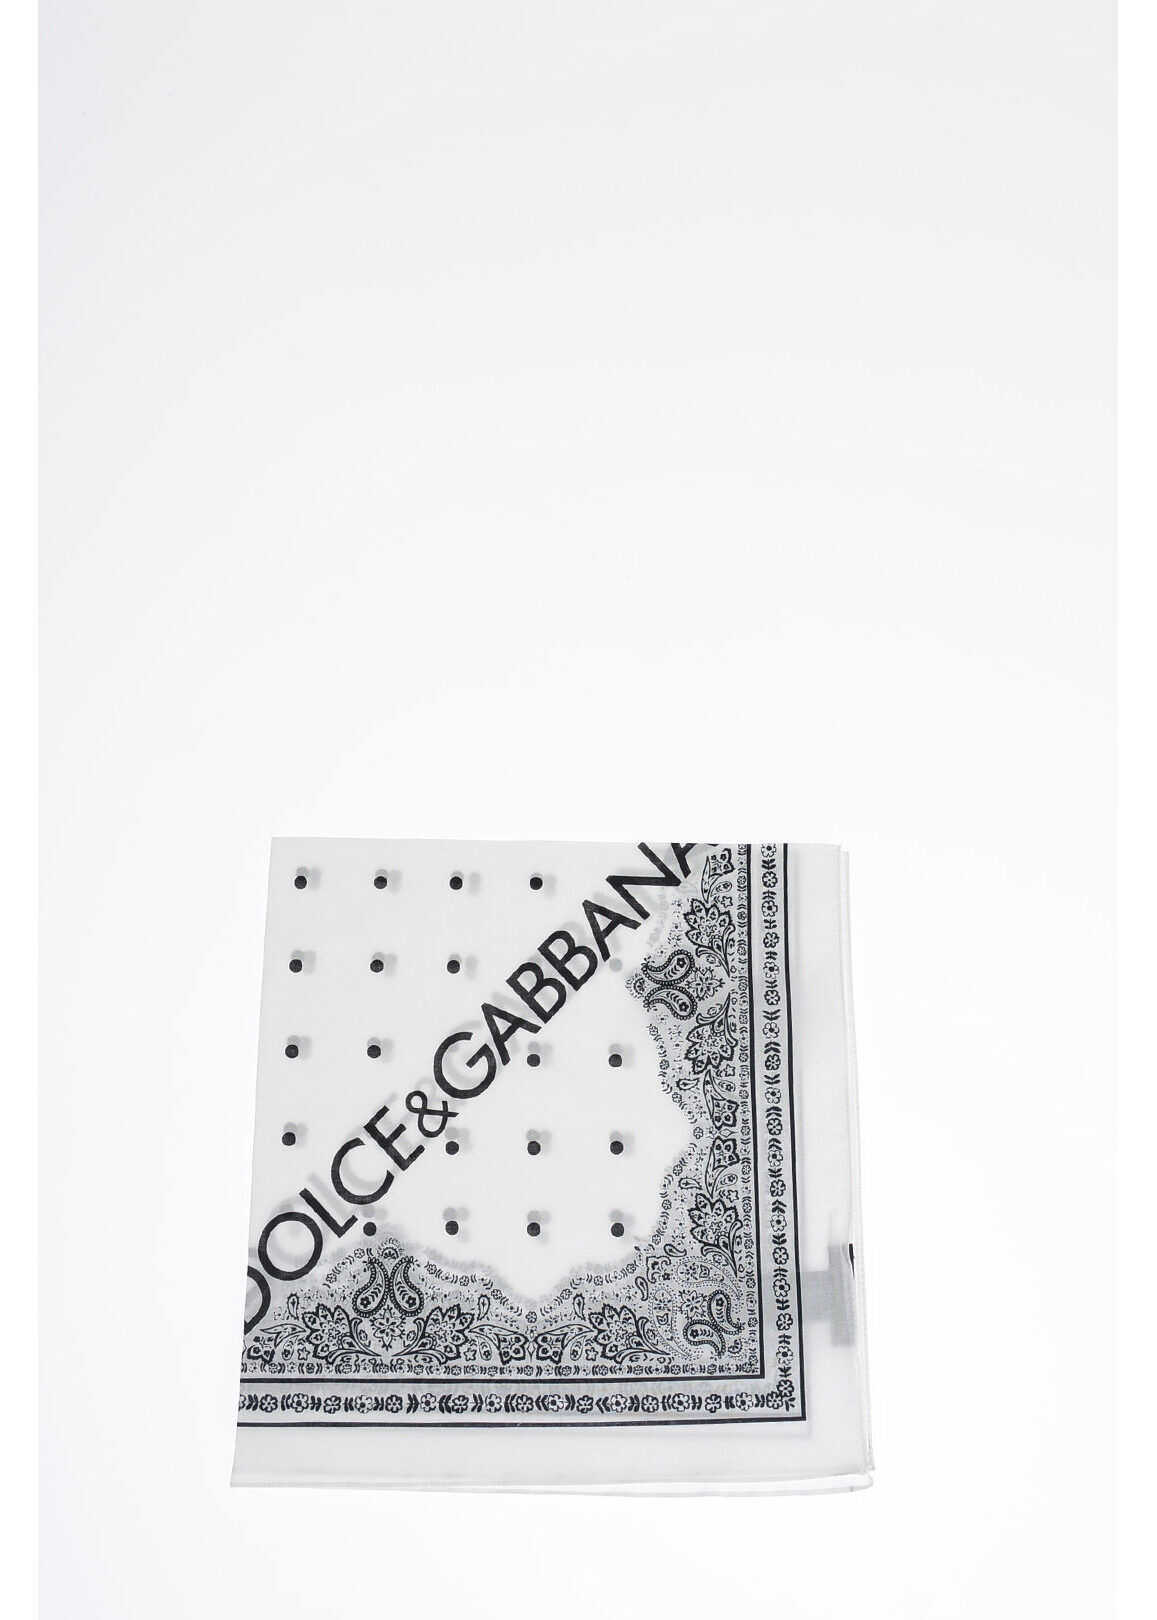 Dolce & Gabbana 50x50 cm Polka Dots Foulard BLACK & WHITE